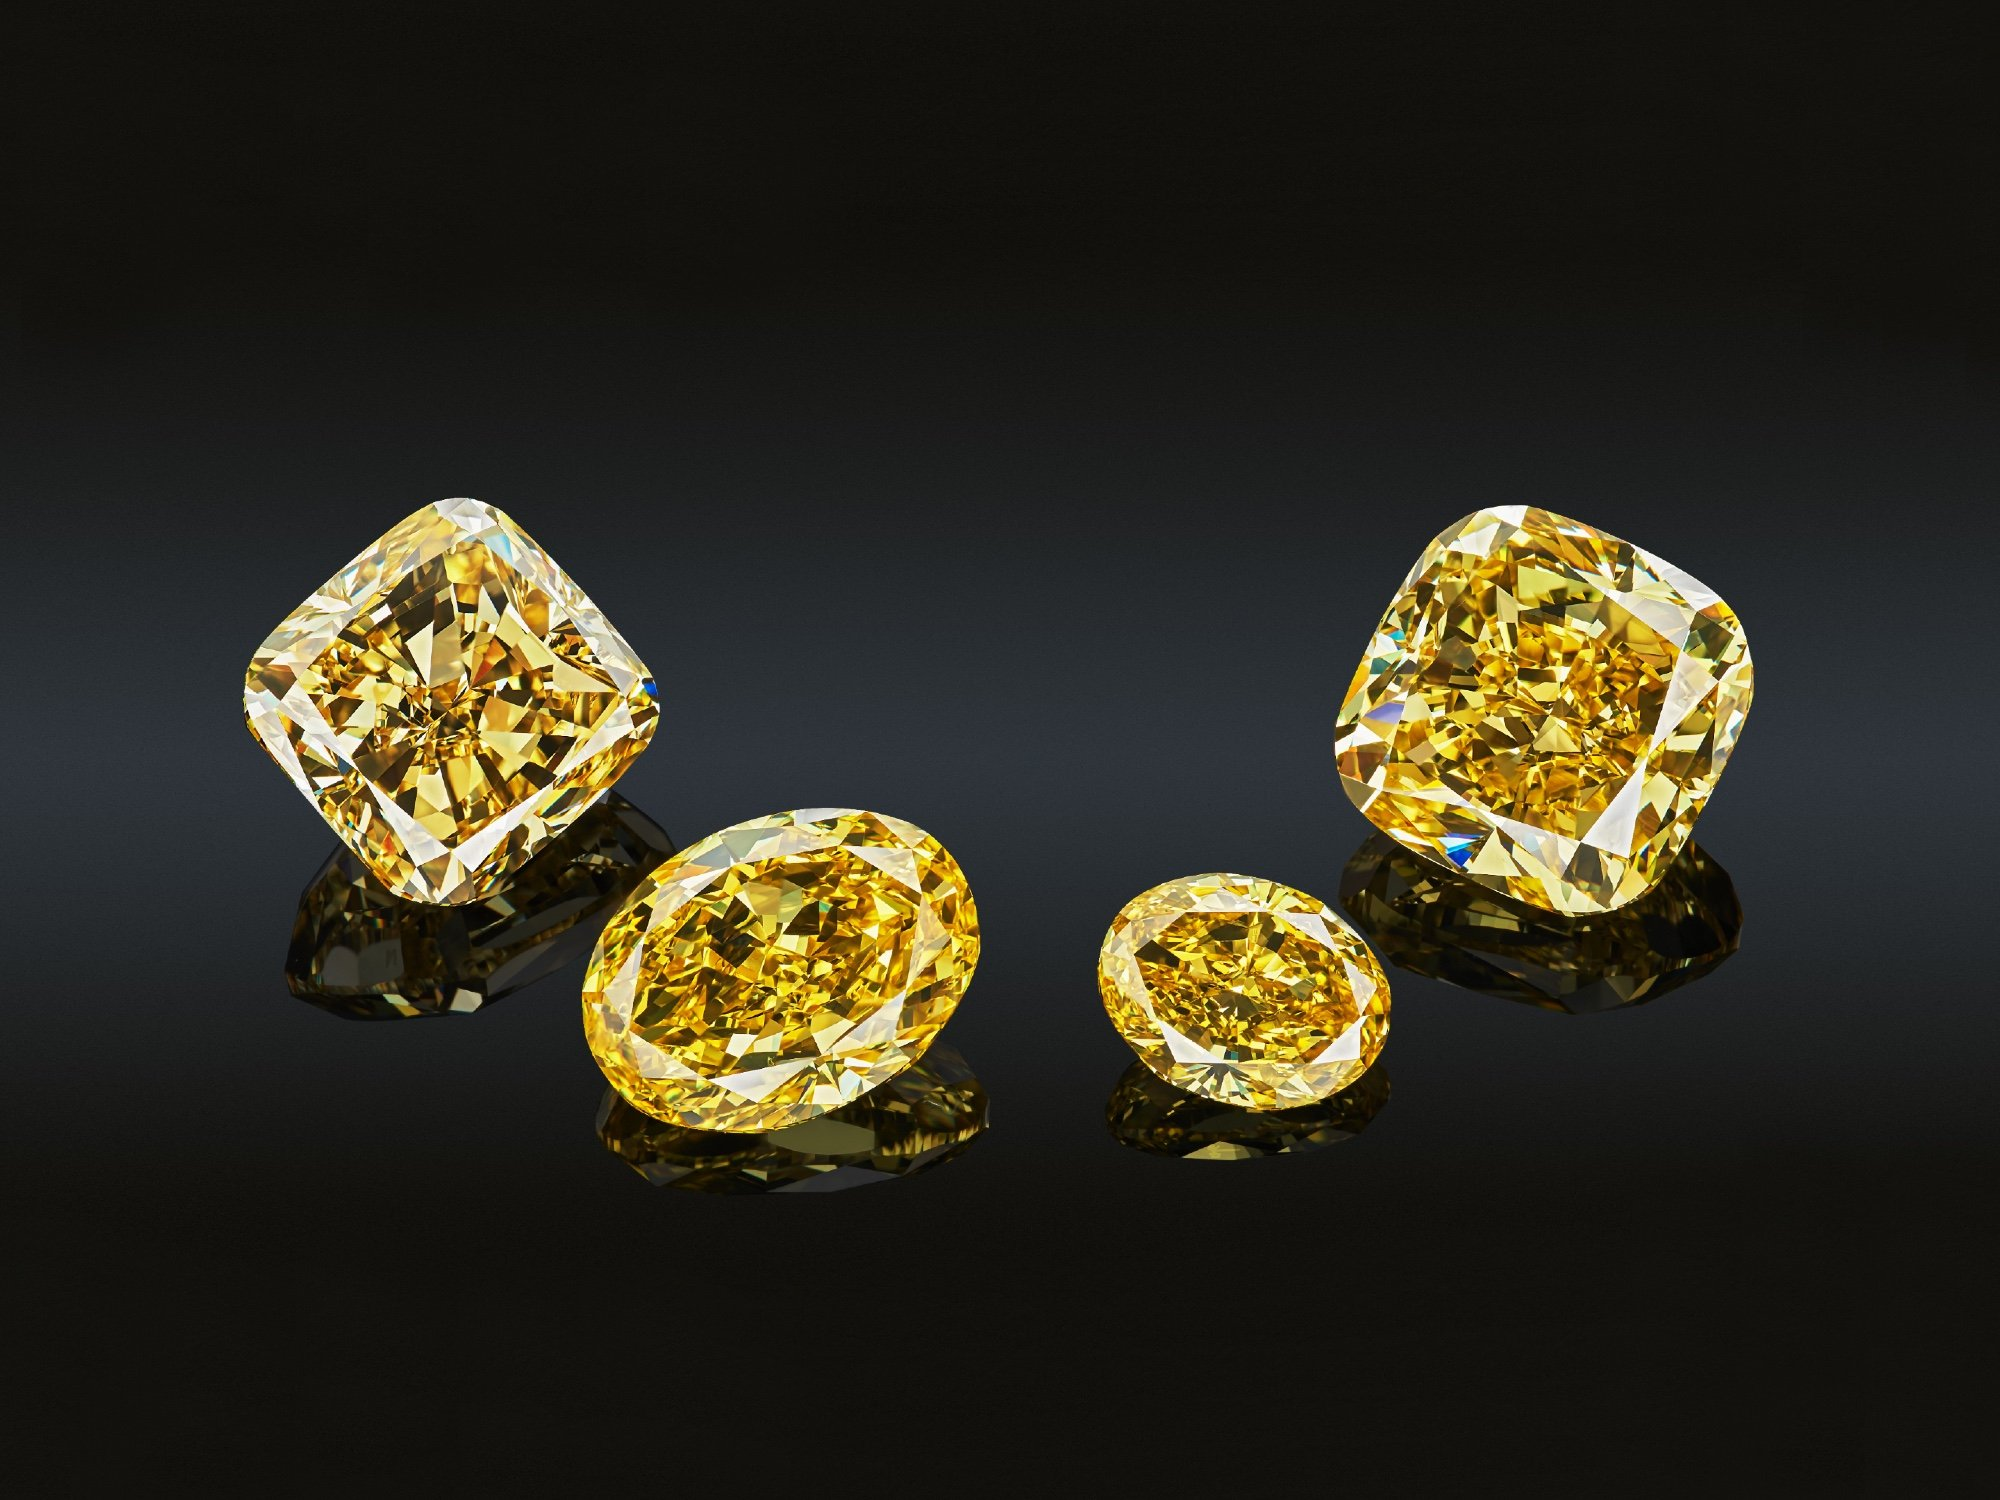 Yellow Diamonds Buying Guide | Diamond Buzz